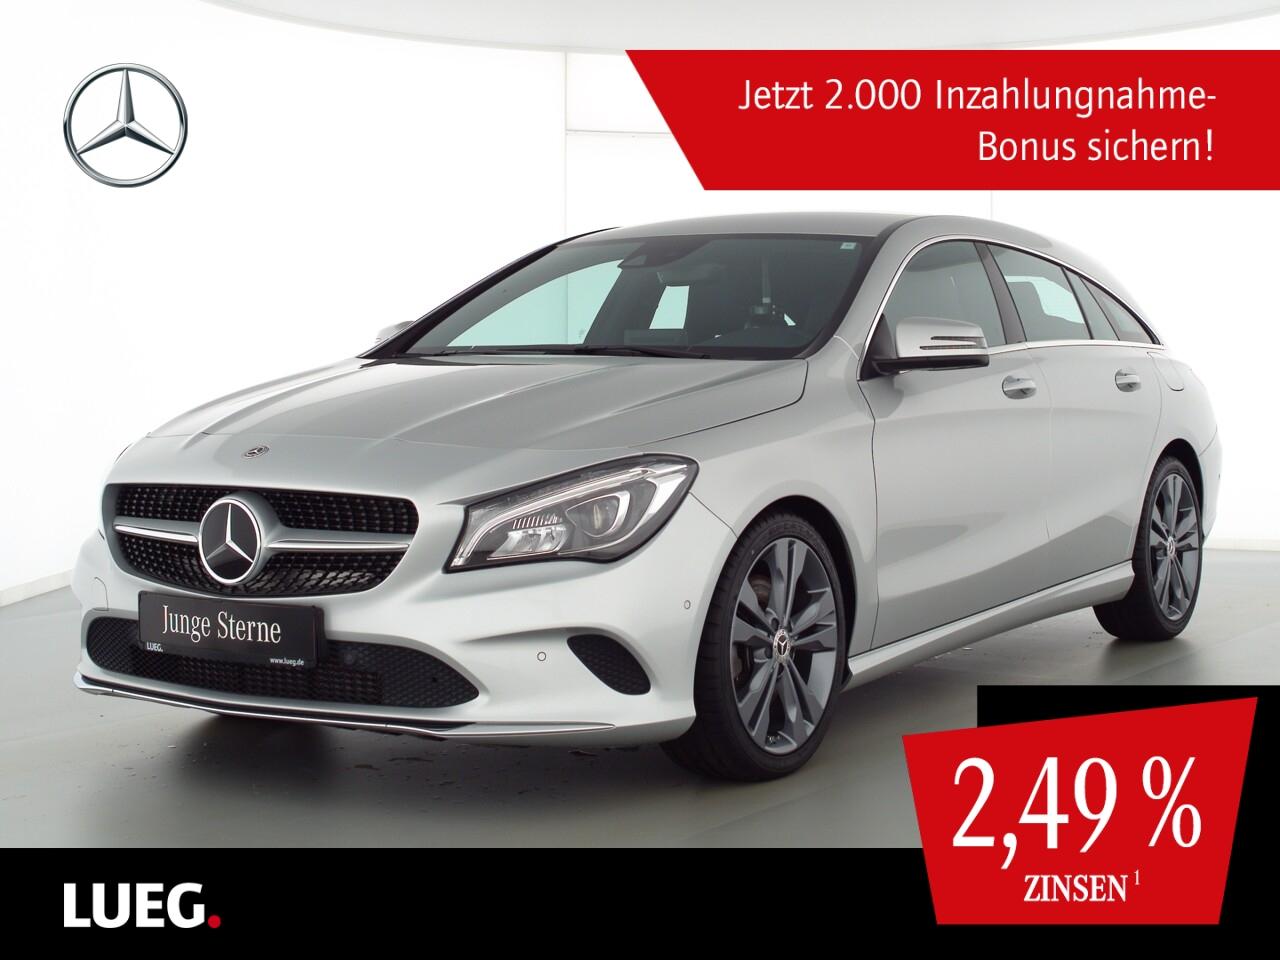 Mercedes-Benz CLA 250 4M SB Urban+COM+LED-HP+Sthzg+Distr+HarmK, Jahr 2018, Benzin